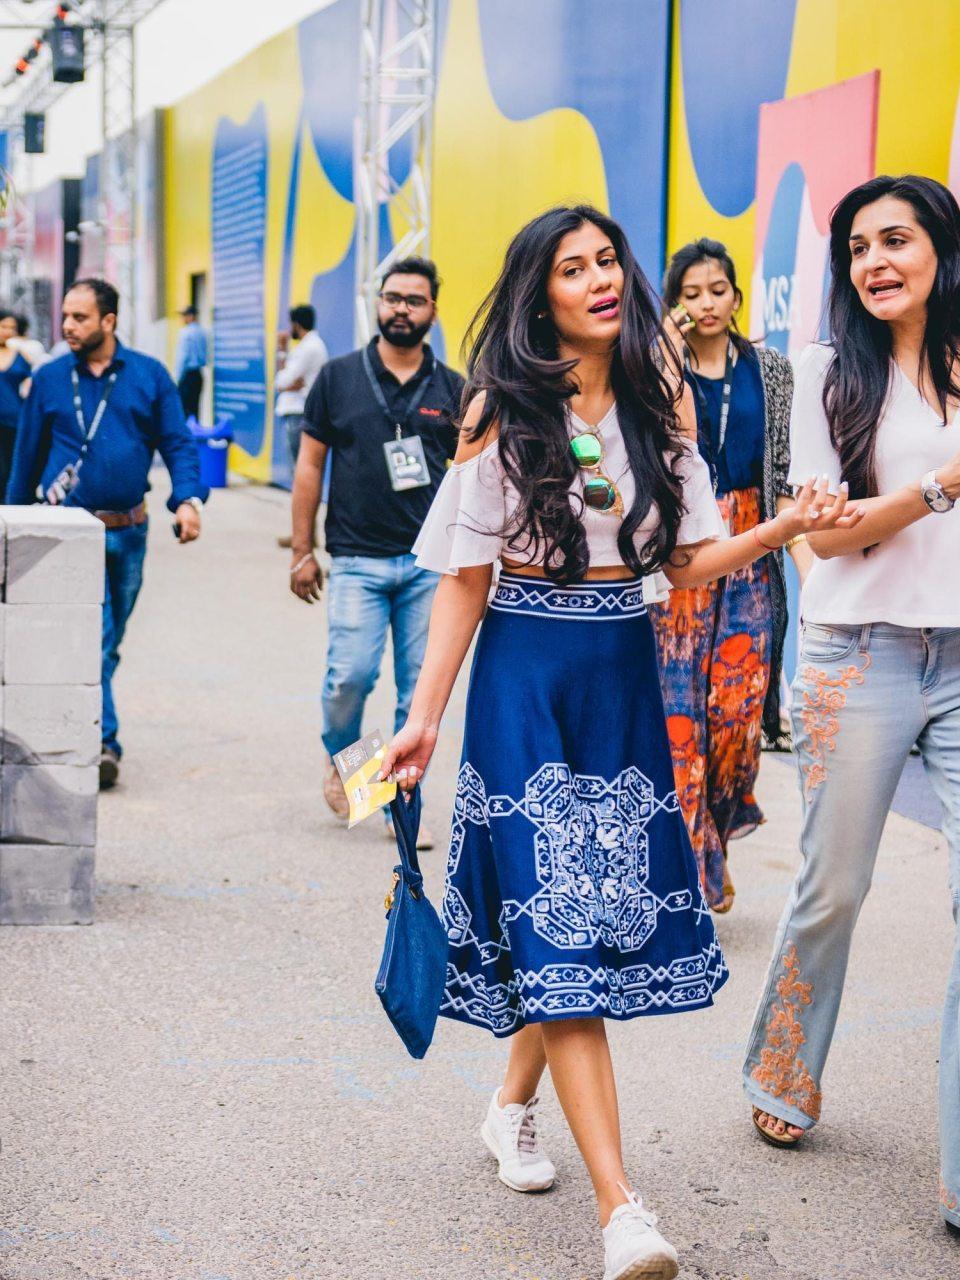 #EyesForStreetStyle, #AIFWAW16, Amazon India Fashion Week Autumn Winter 2016, Naina.co, Naina Redhu, Luxury Photographer, Lifestyle Photographer, Luxury Blogger, Lifestyle Blogger, Experience Collector, Personal Style